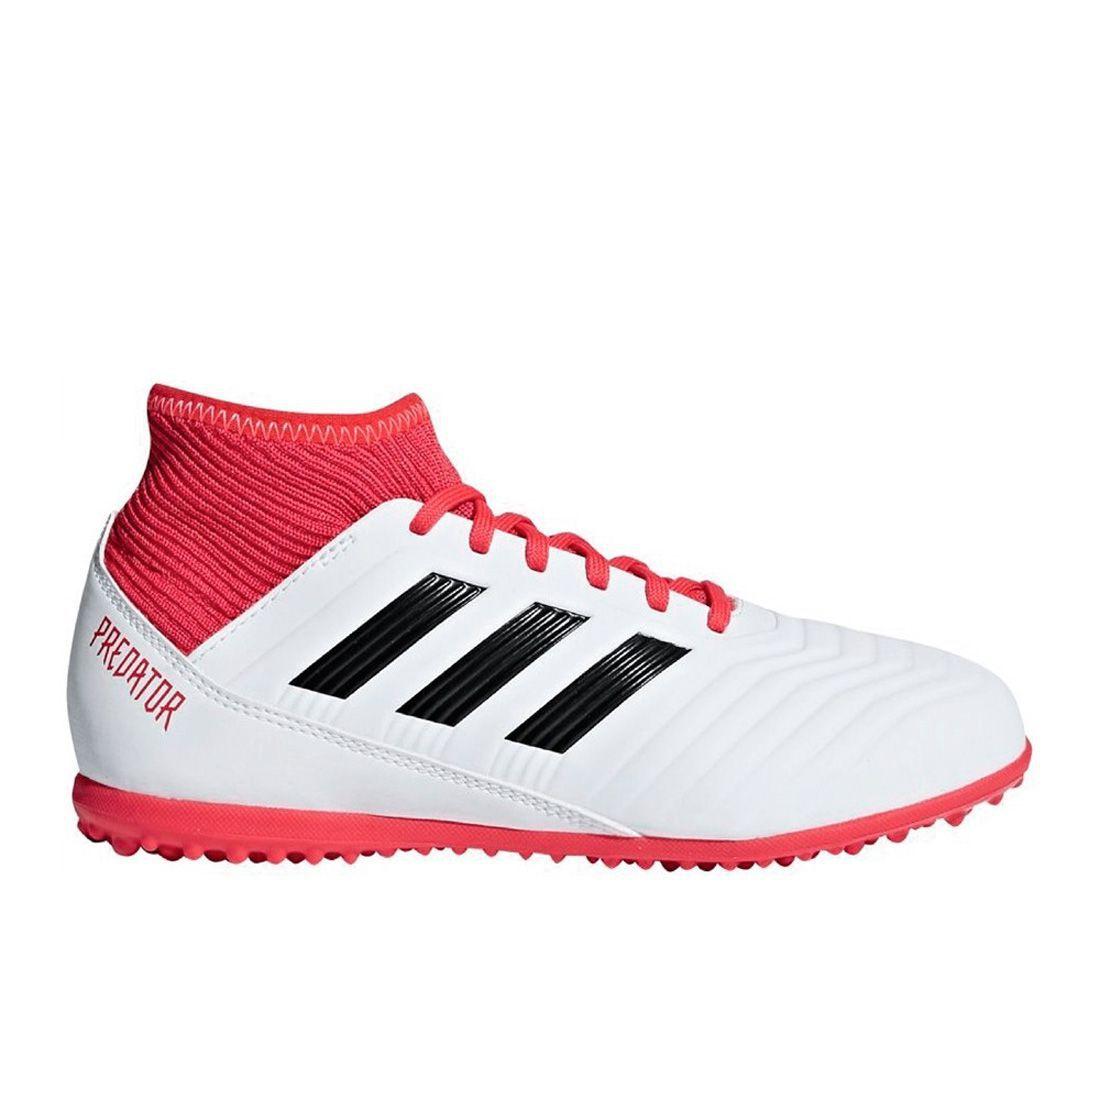 Chuteira Society Adidas Predator Tango 18.3 TF CP 9930 Branca nº 40 - JP  Import ... 97720b756ff2e